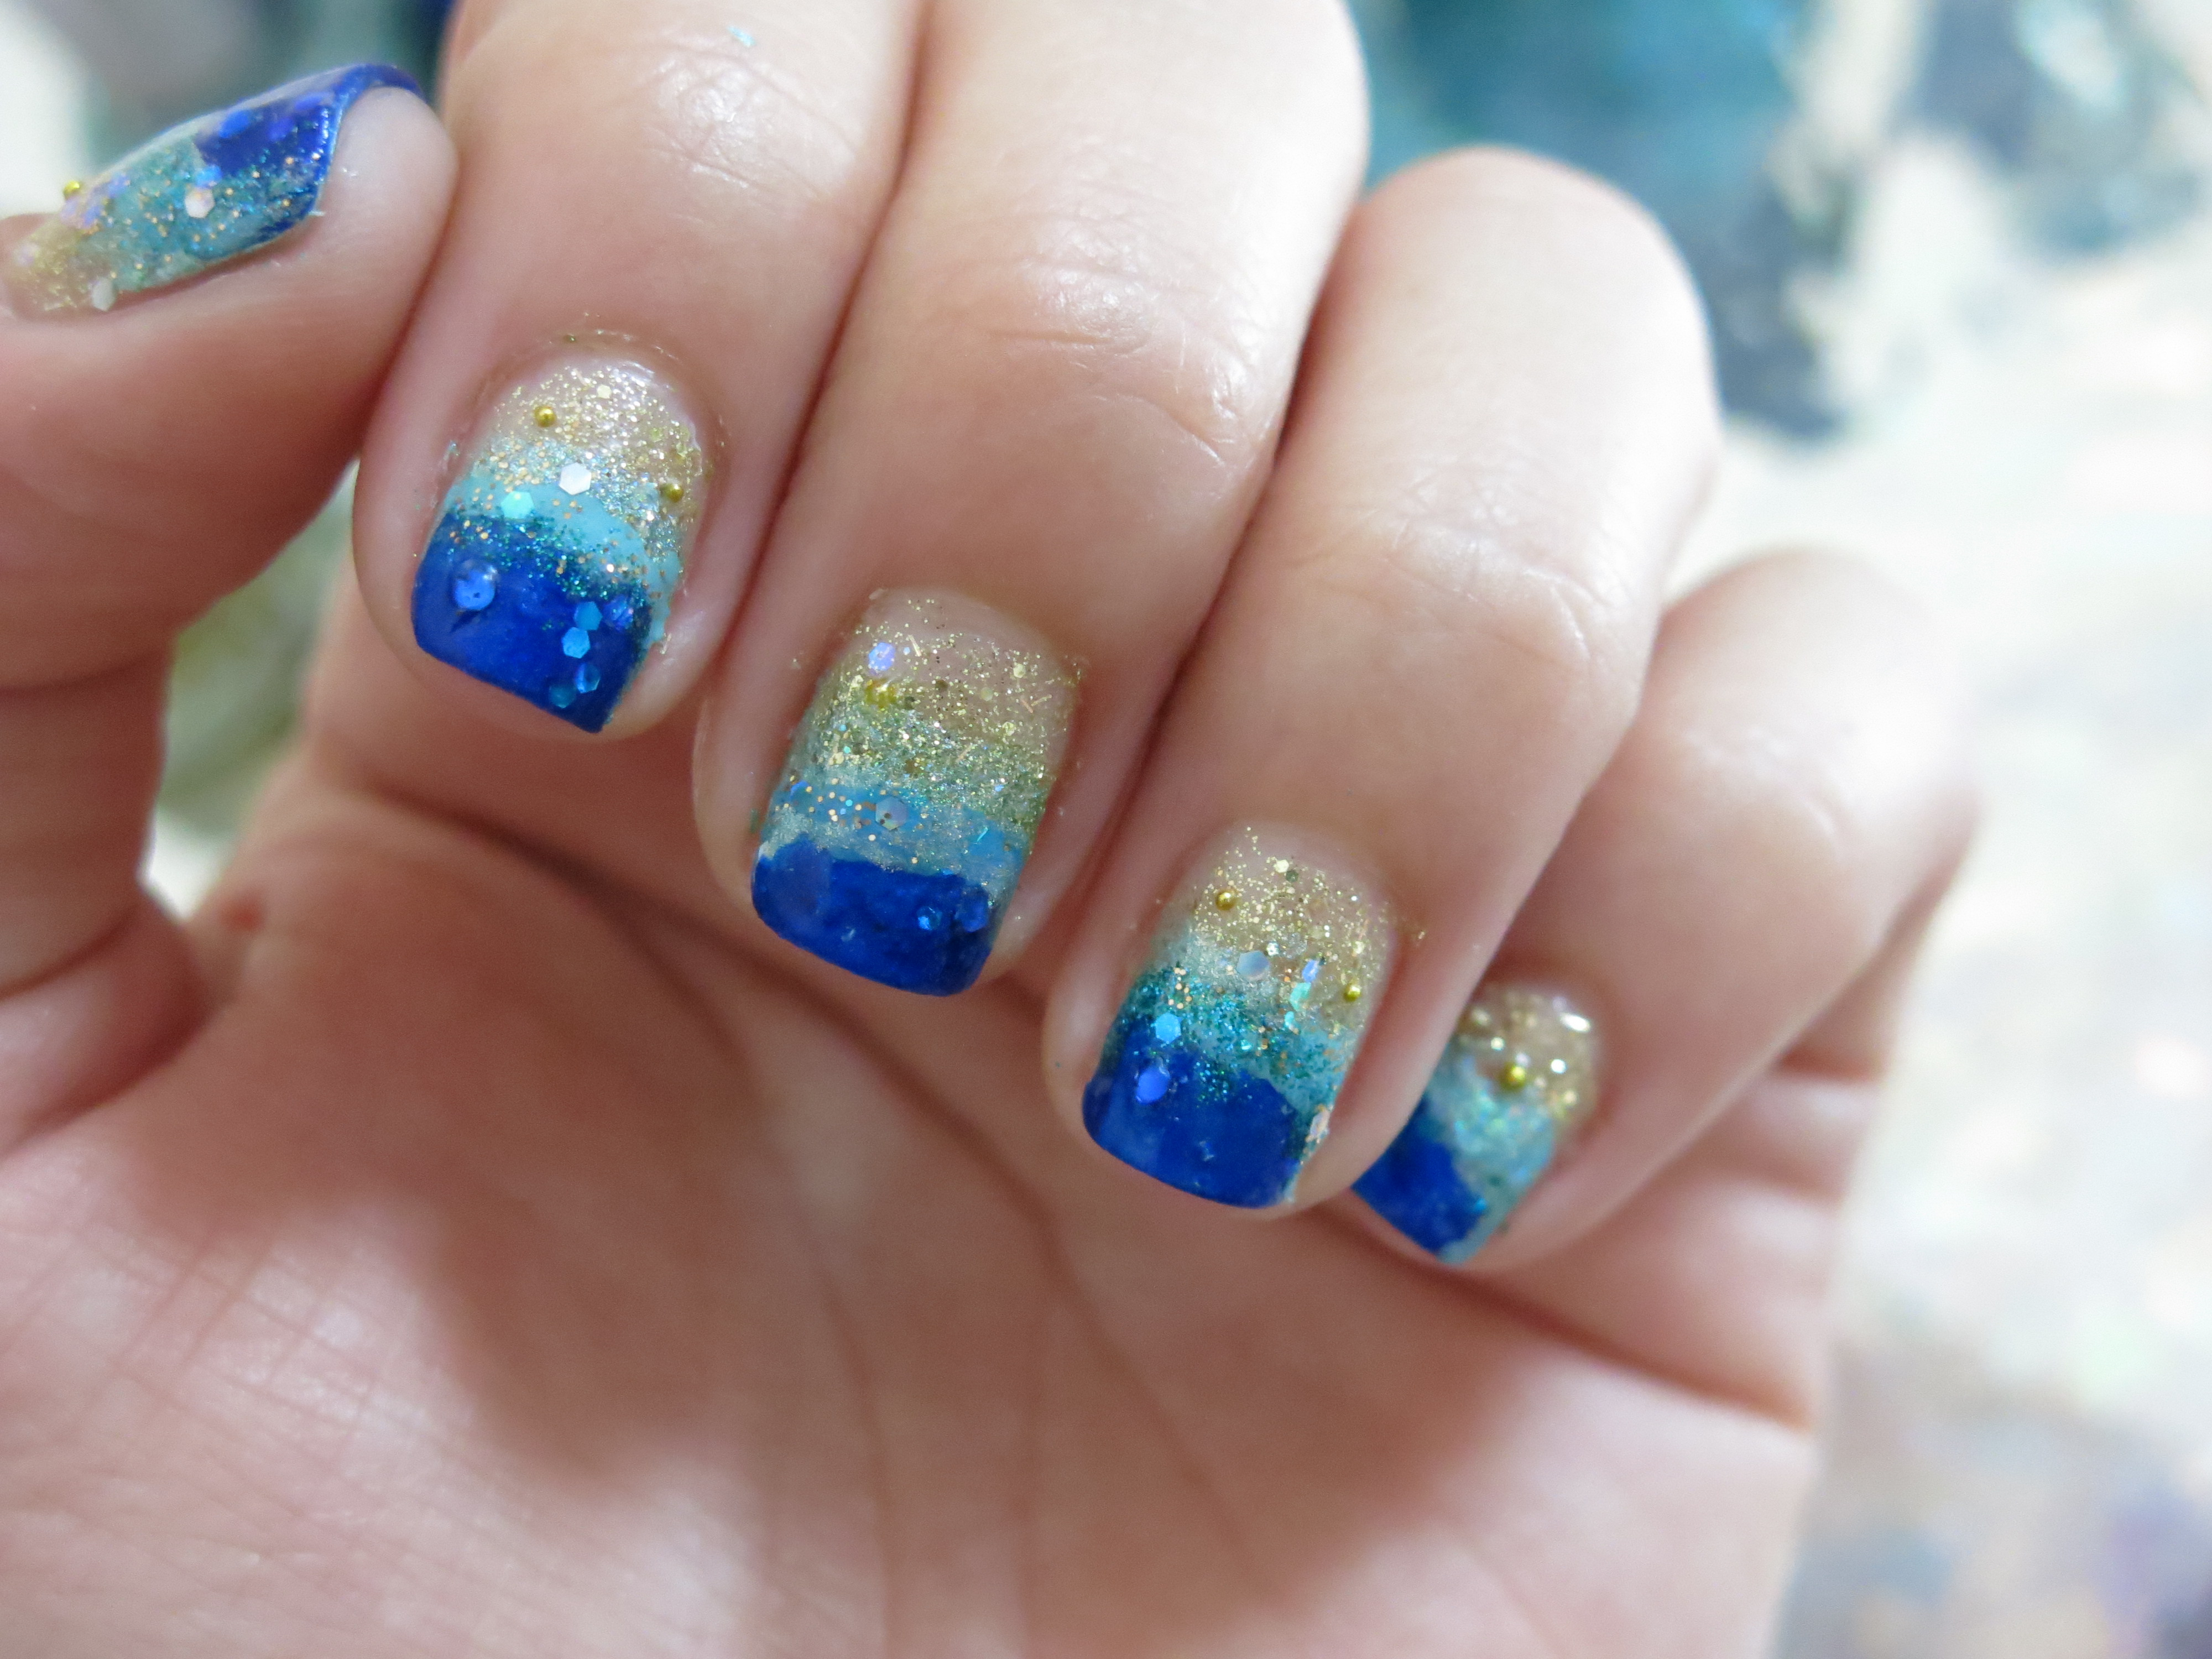 Tutorial: Uñas de playa | Adrix Nails: Uñas, barnices, nail art!♥